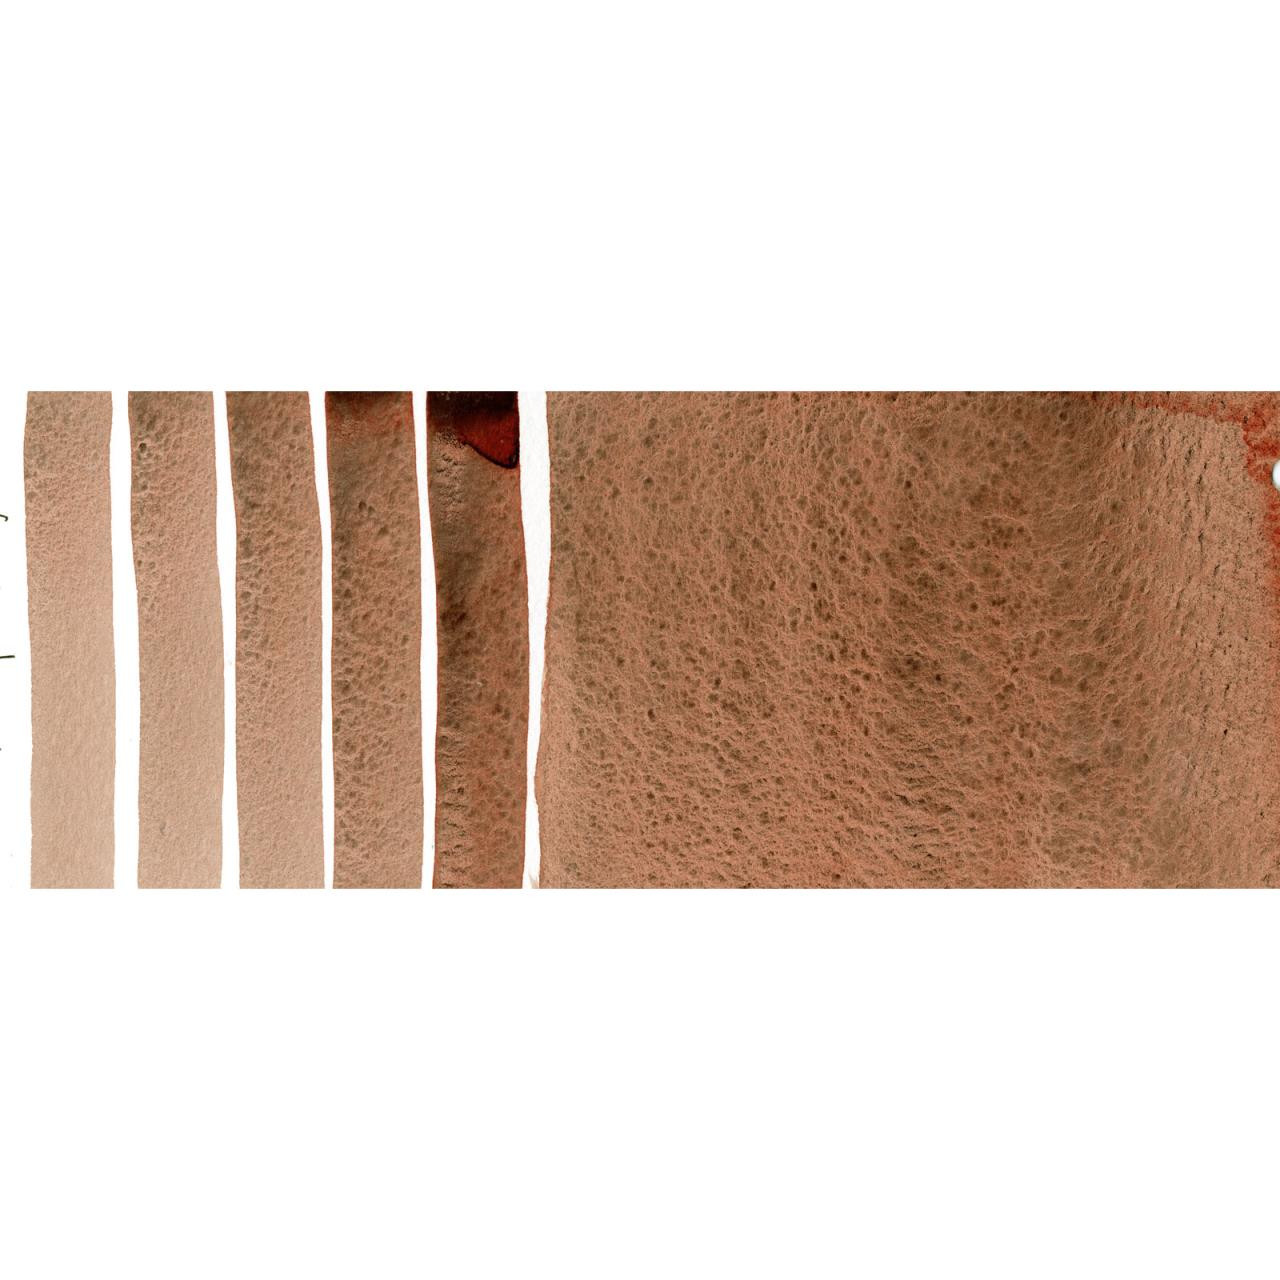 Piemontite Genuine (PrimaTek), DANIEL SMITH Extra Fine Watercolors 5ml Tubes -